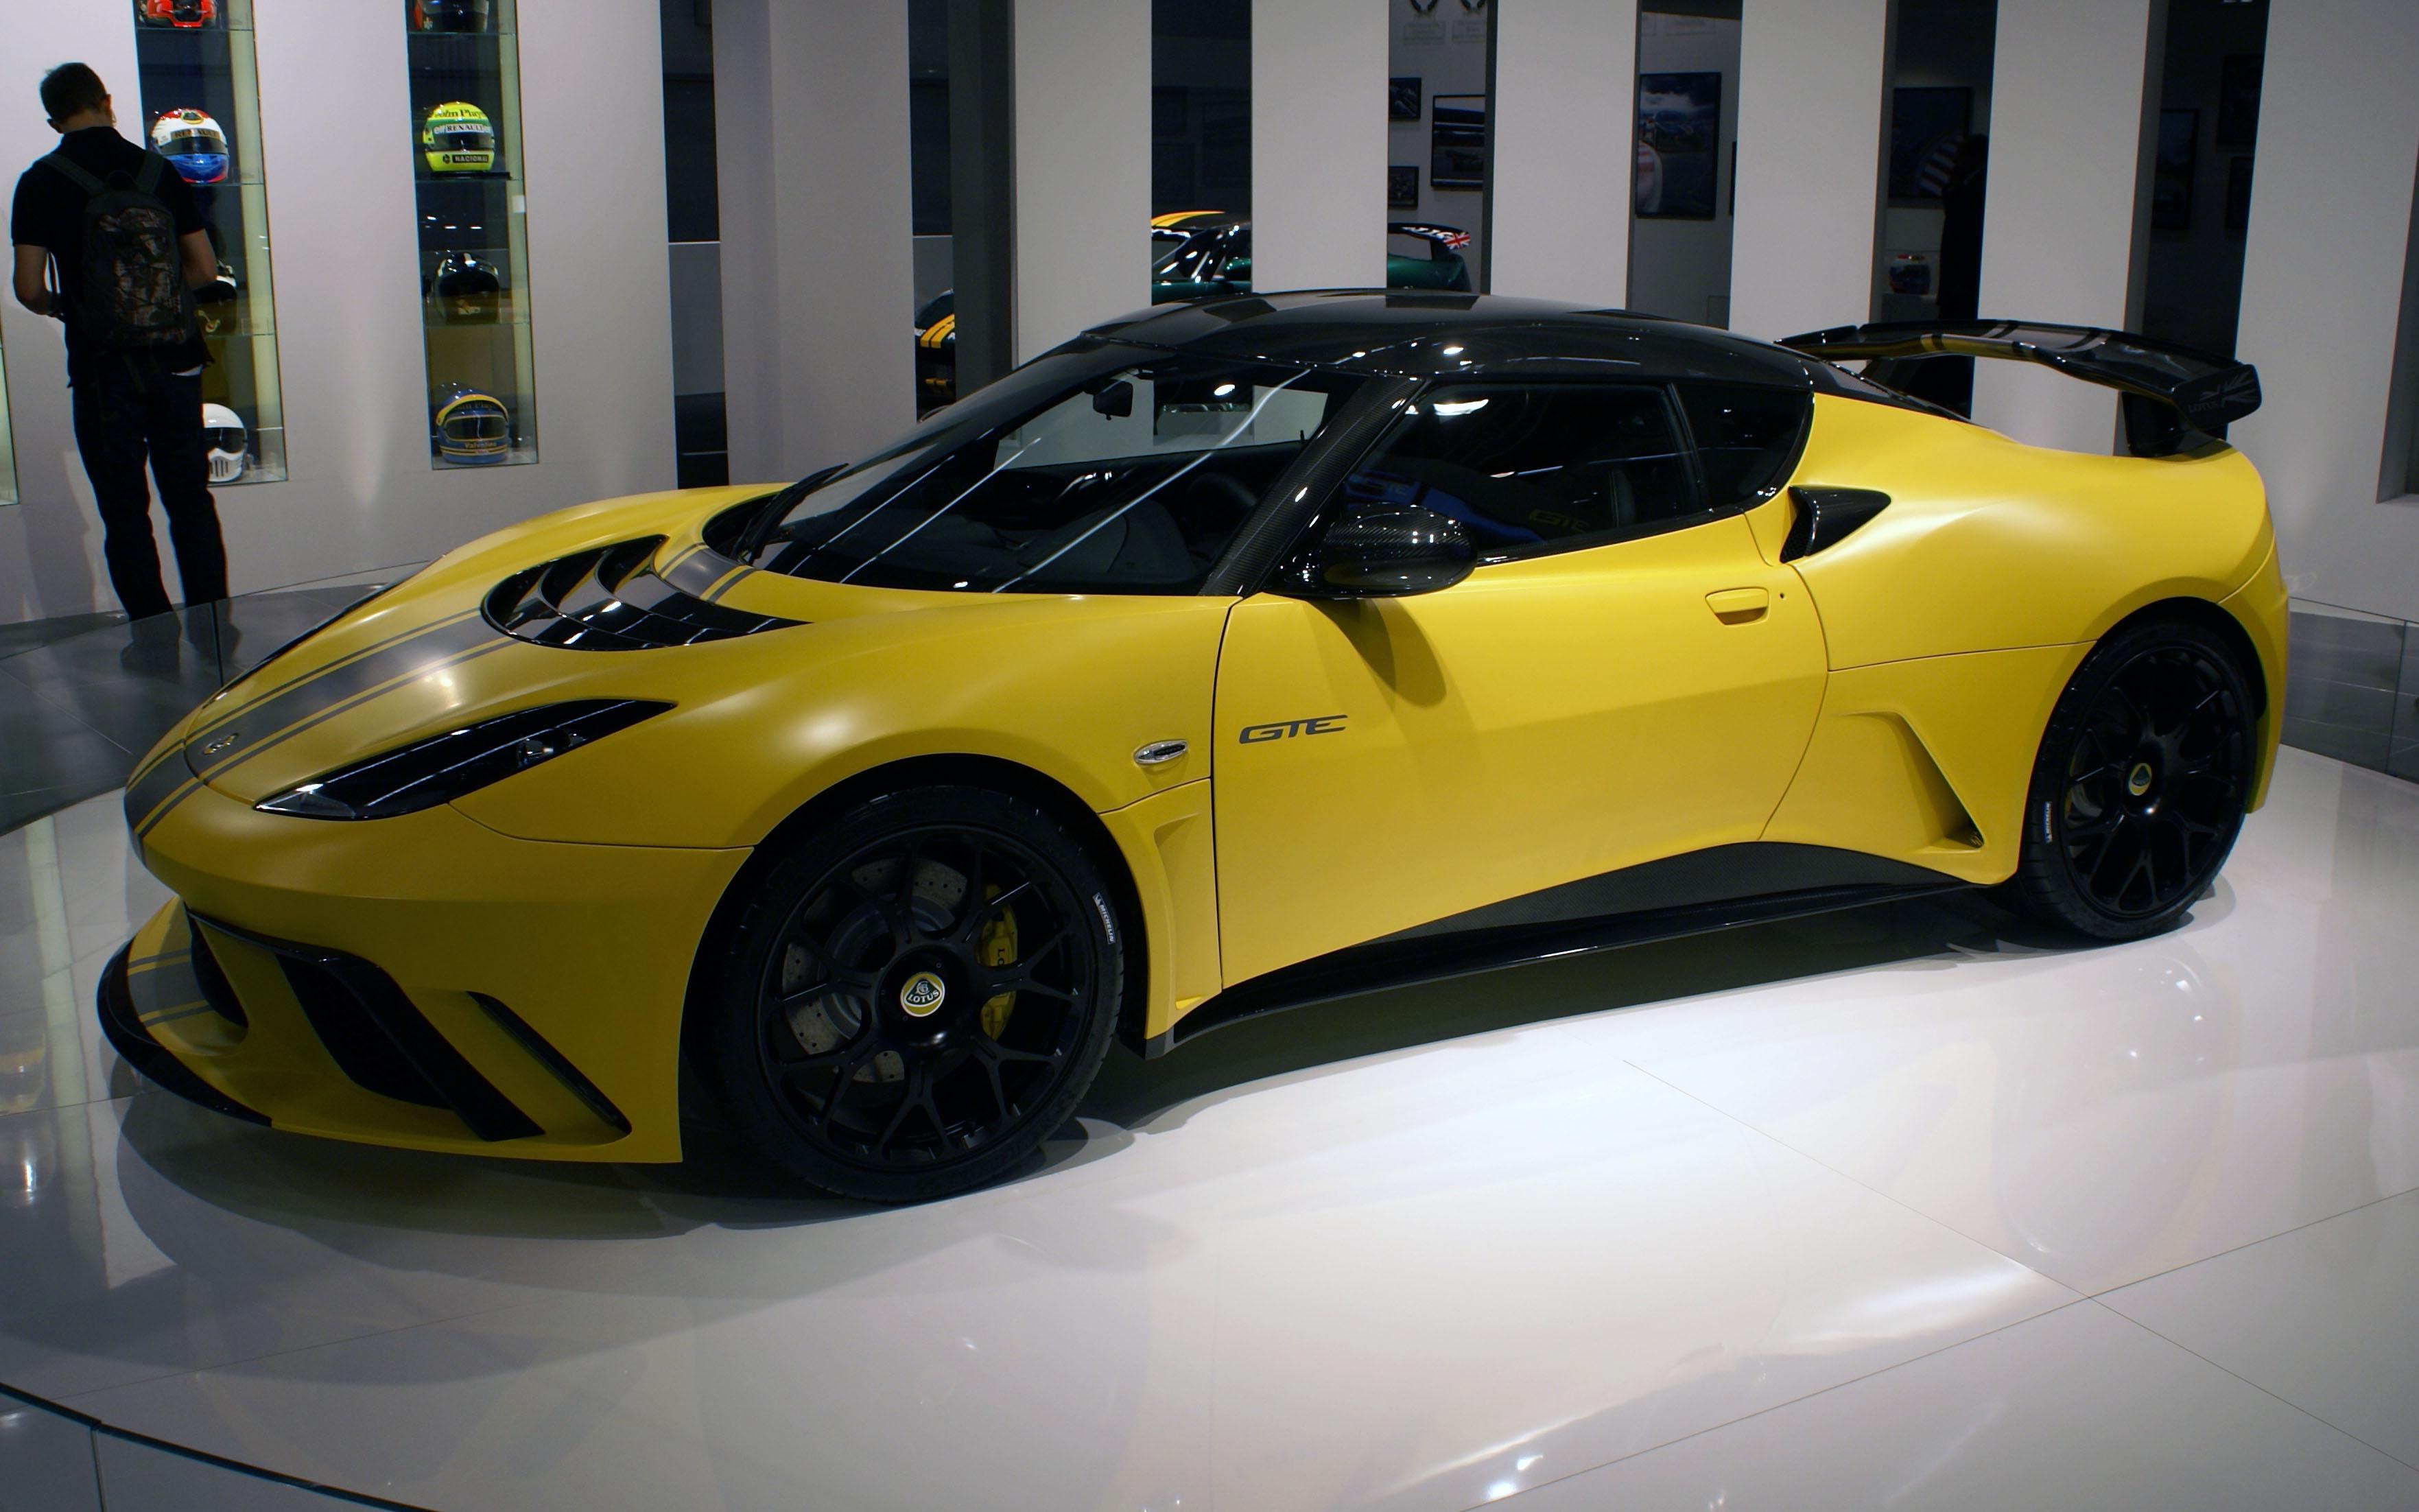 Description Yellow Lotus Evora GTE IAA 2011